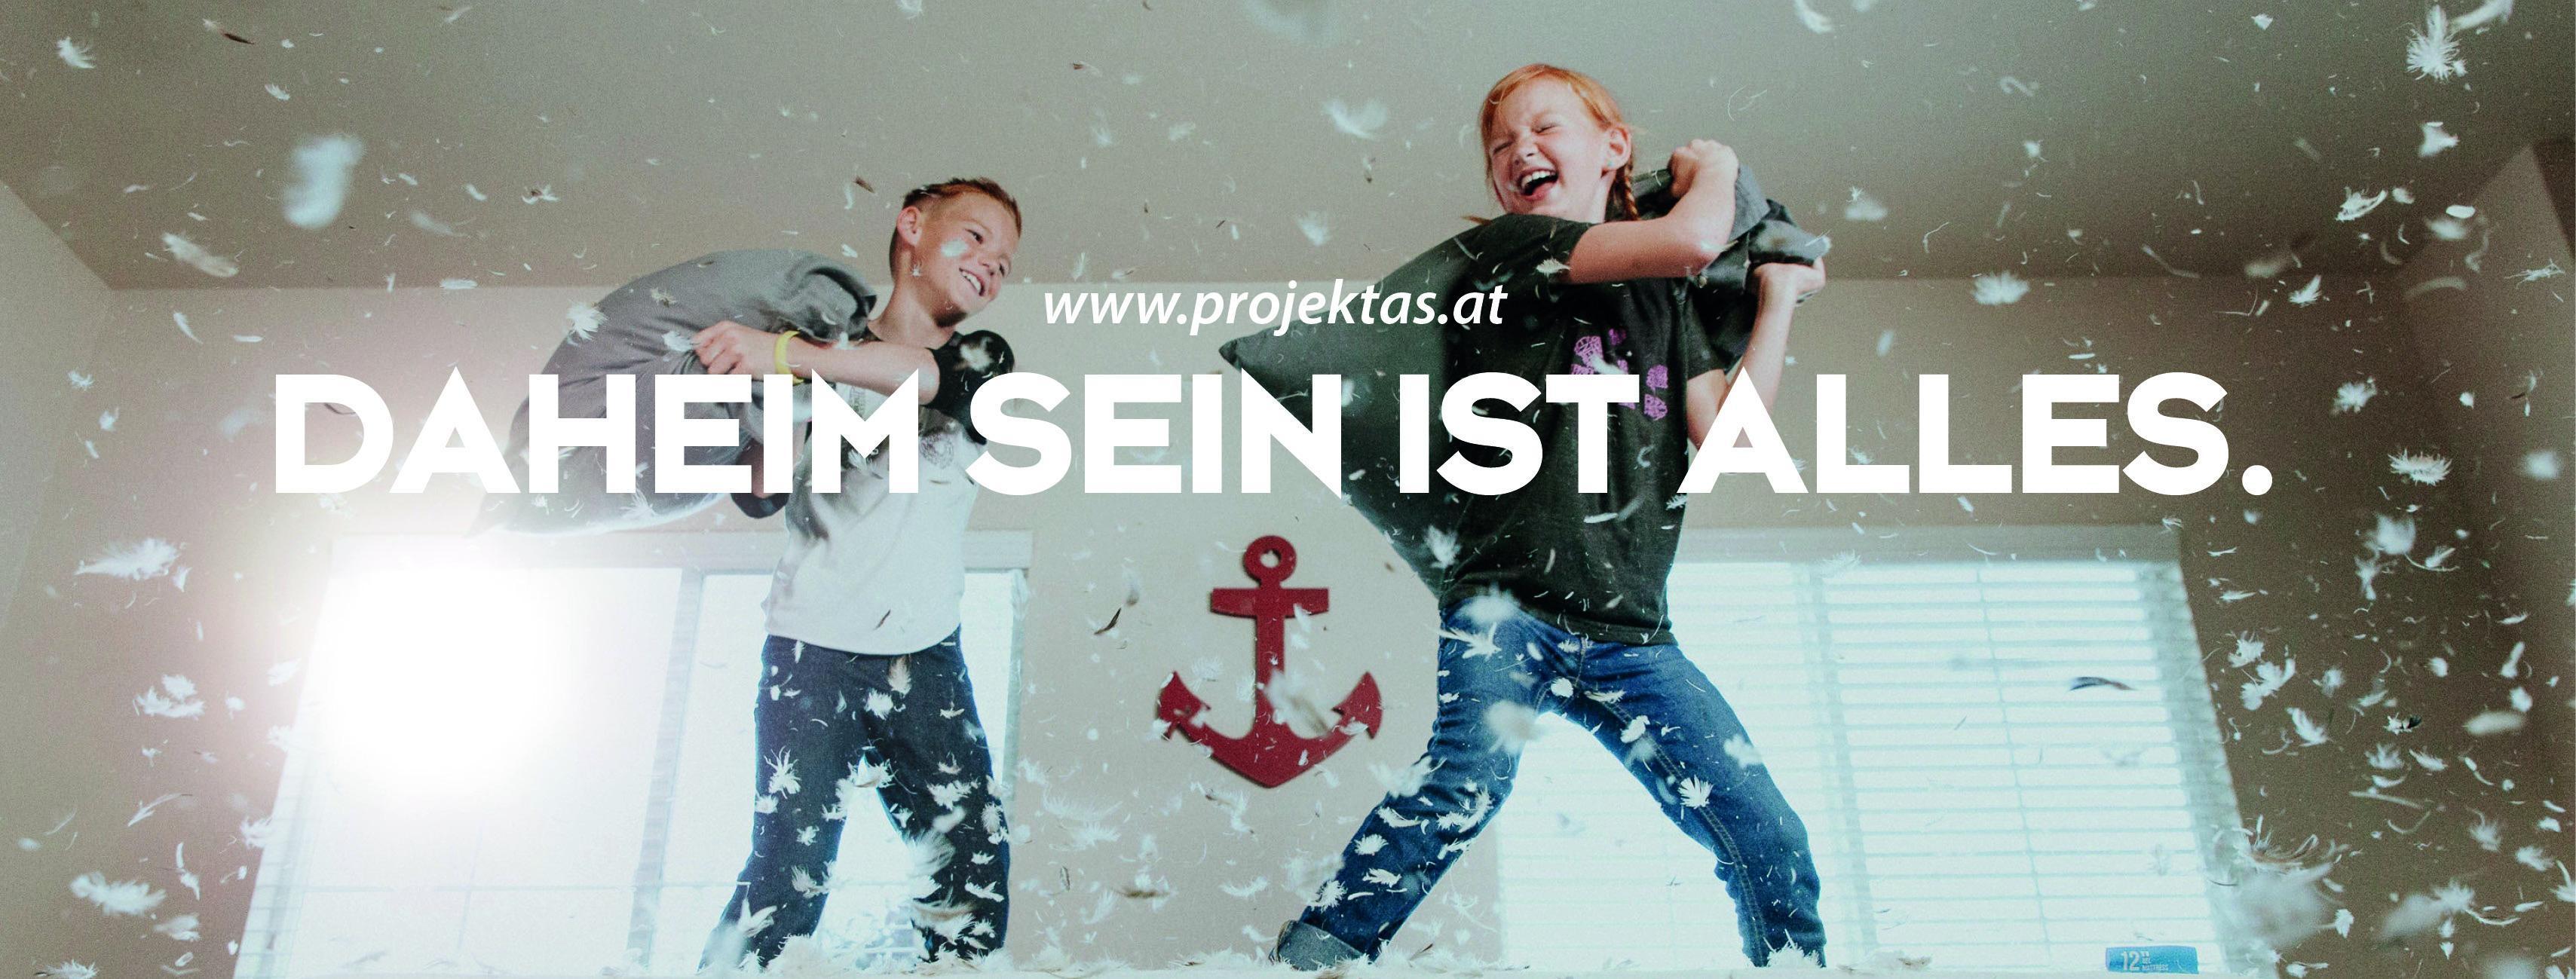 PROJEKTAS - Feistritzer Hinz GmbH & Co OG